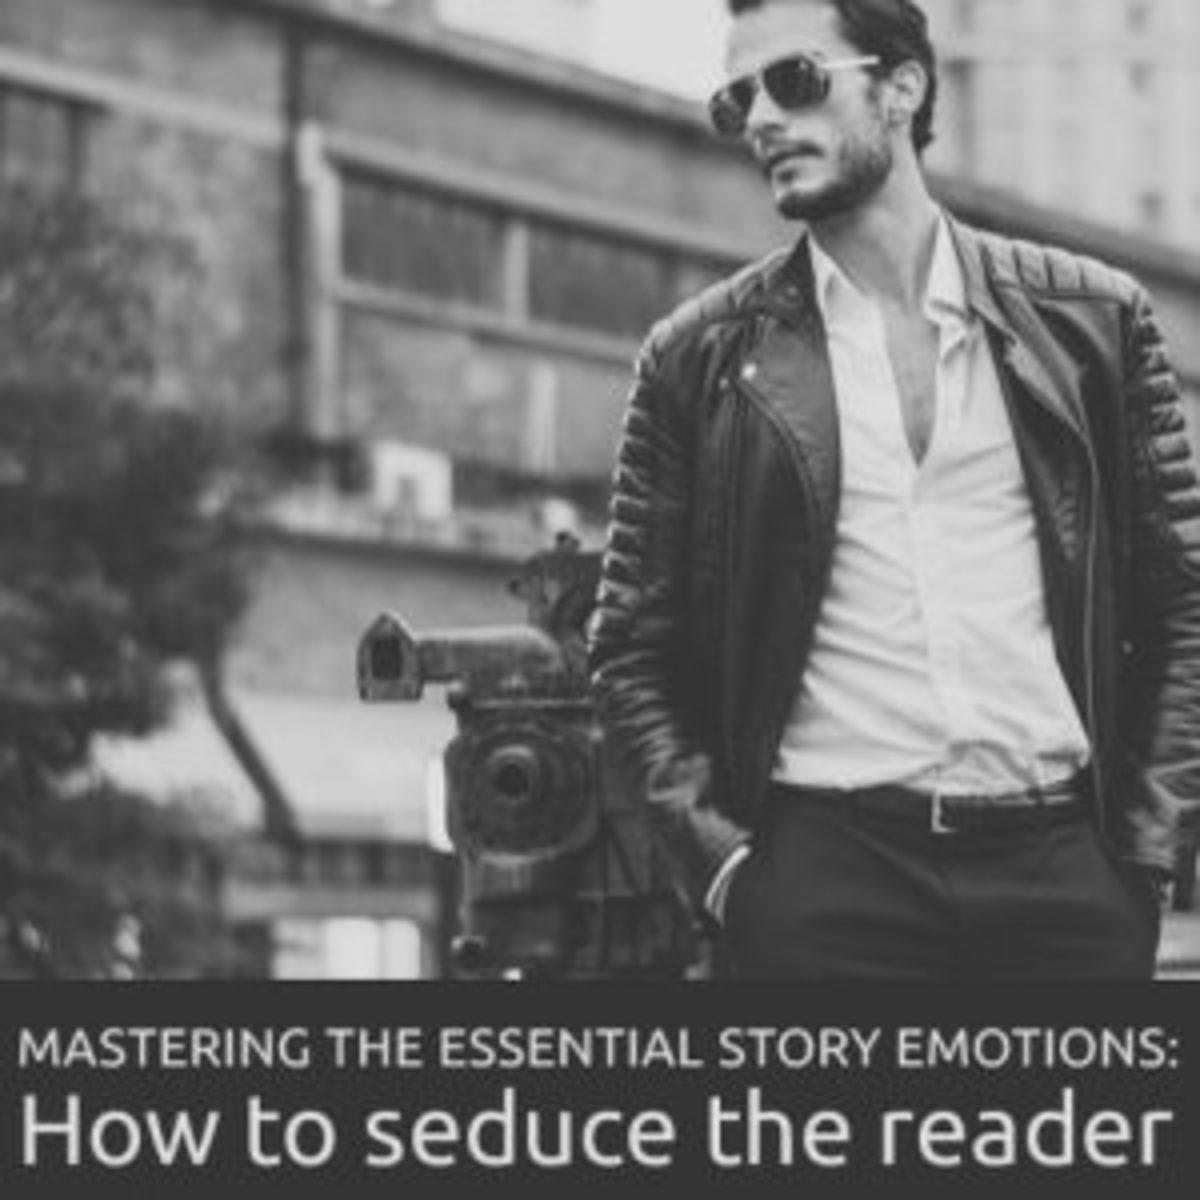 seducing reader